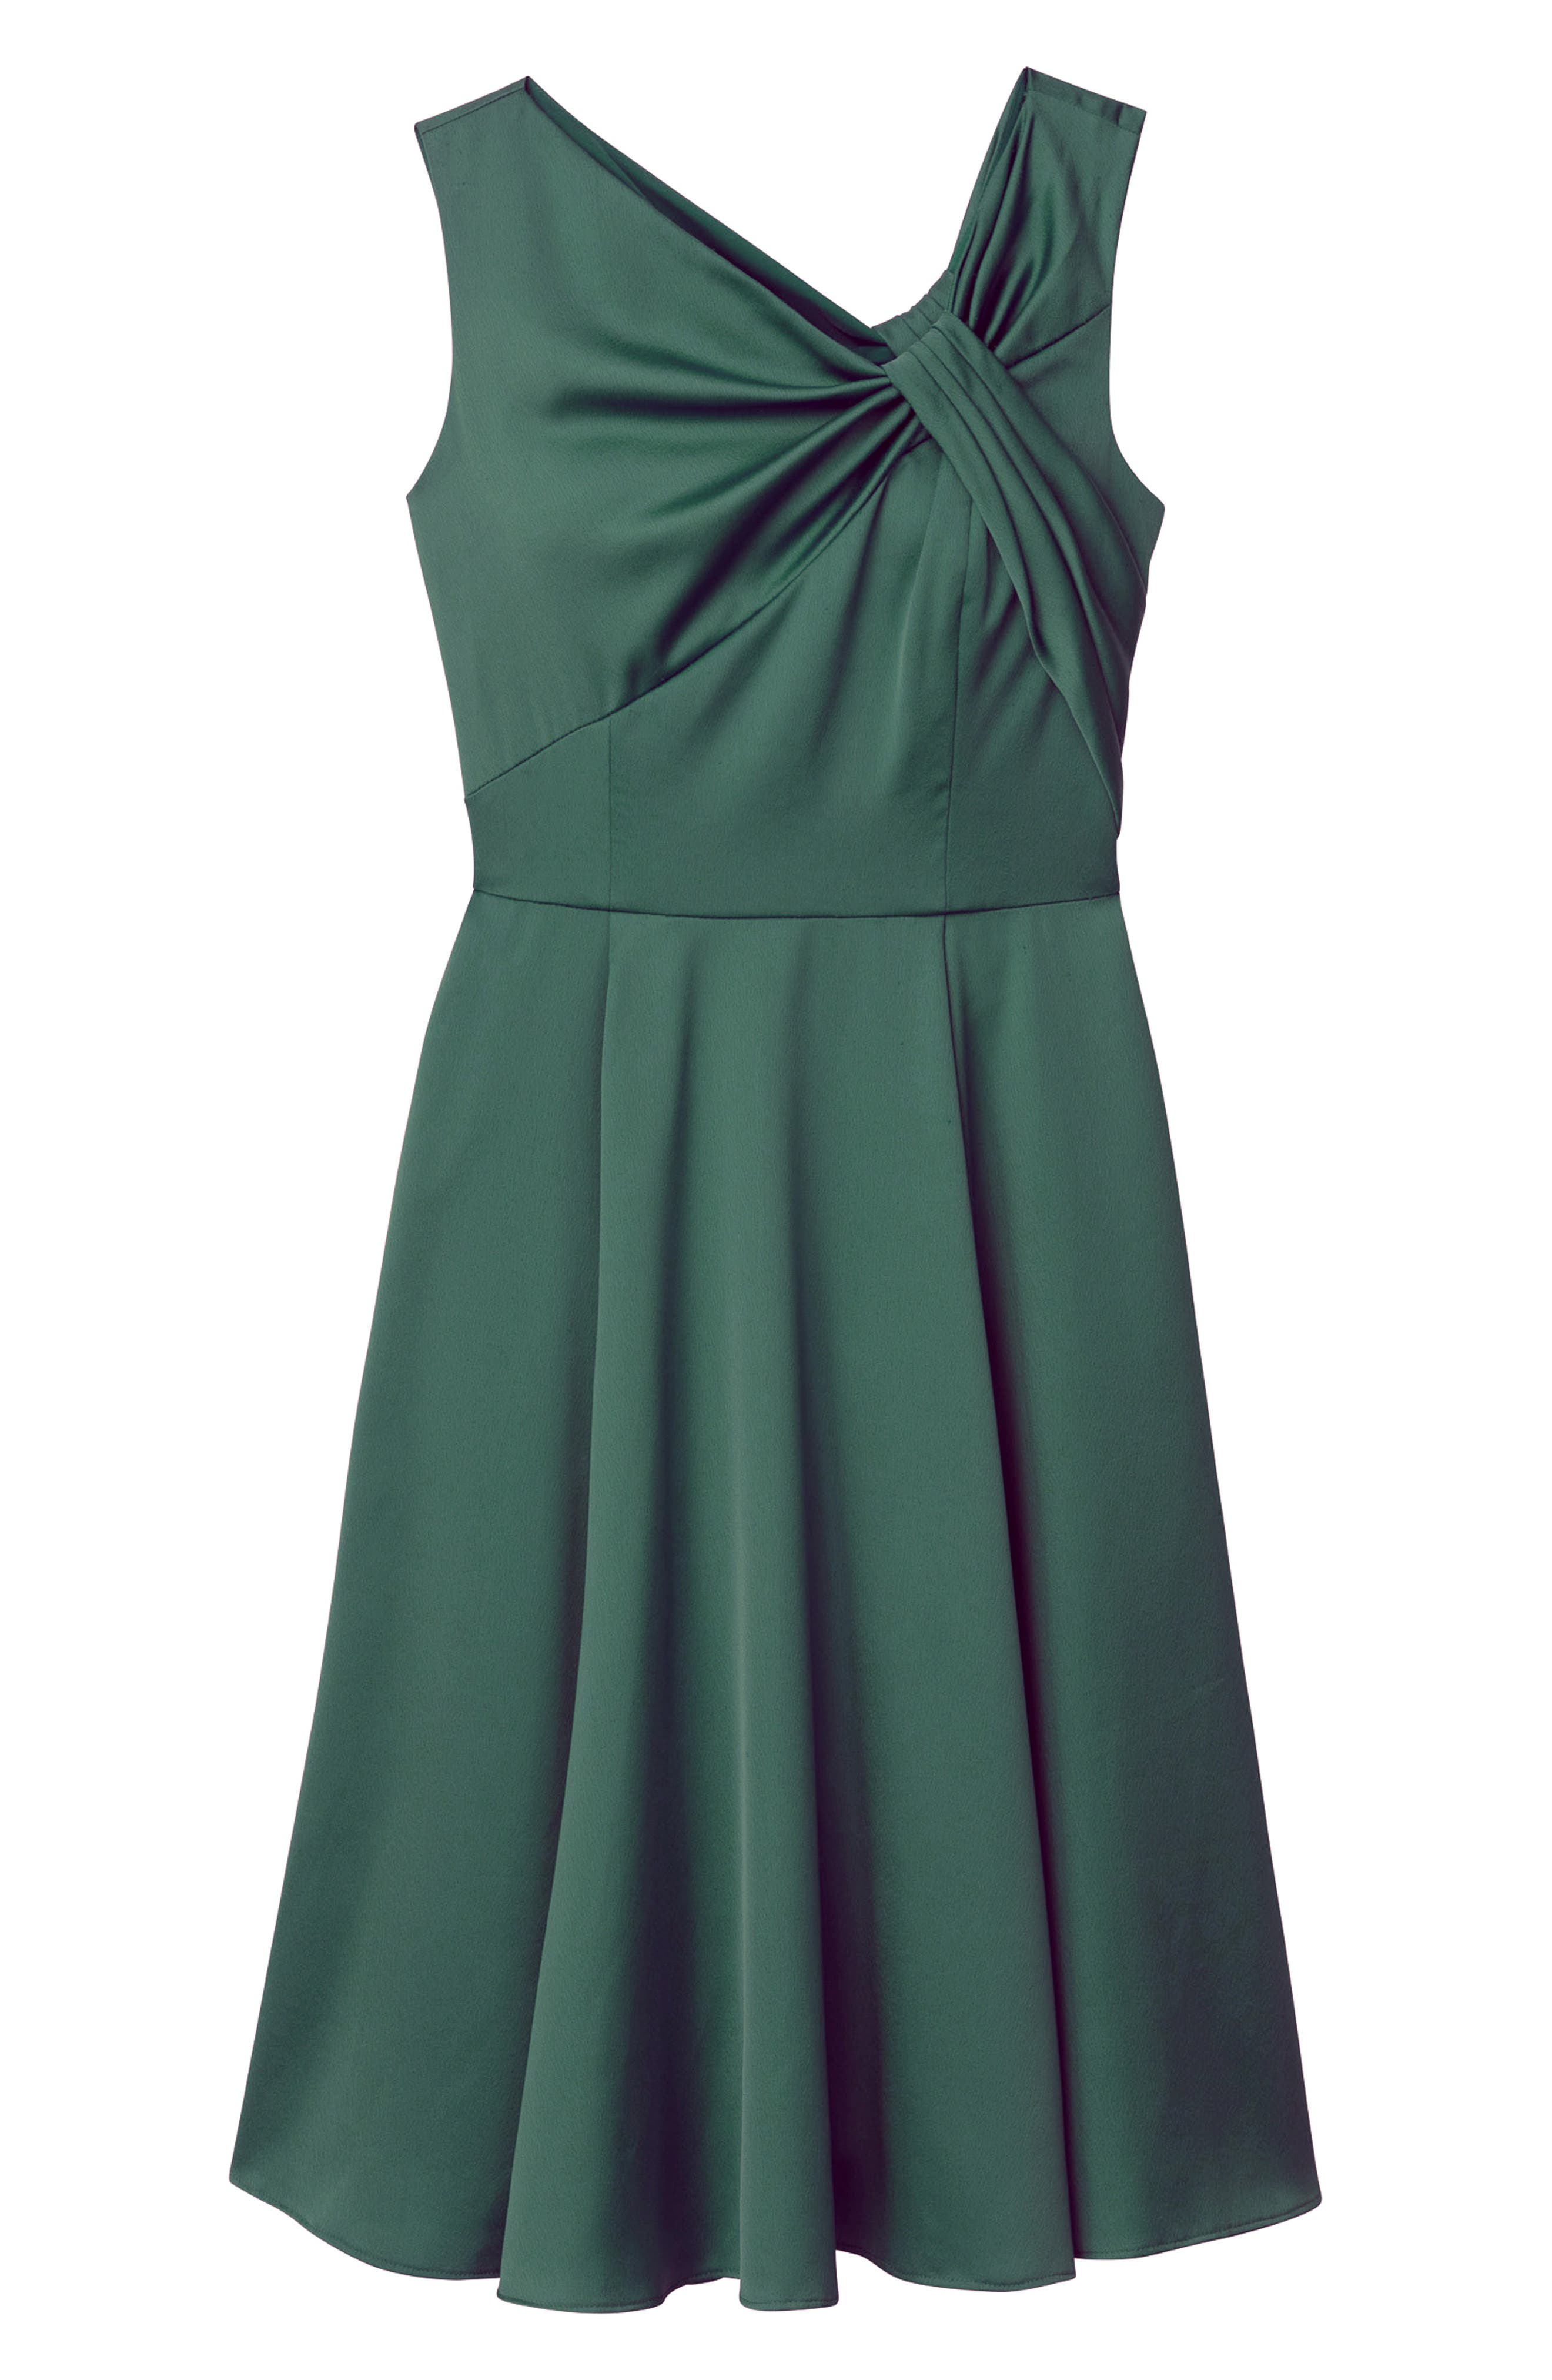 Noelle Twist Neck Satin Dress,                             Alternate thumbnail 4, color,                             306